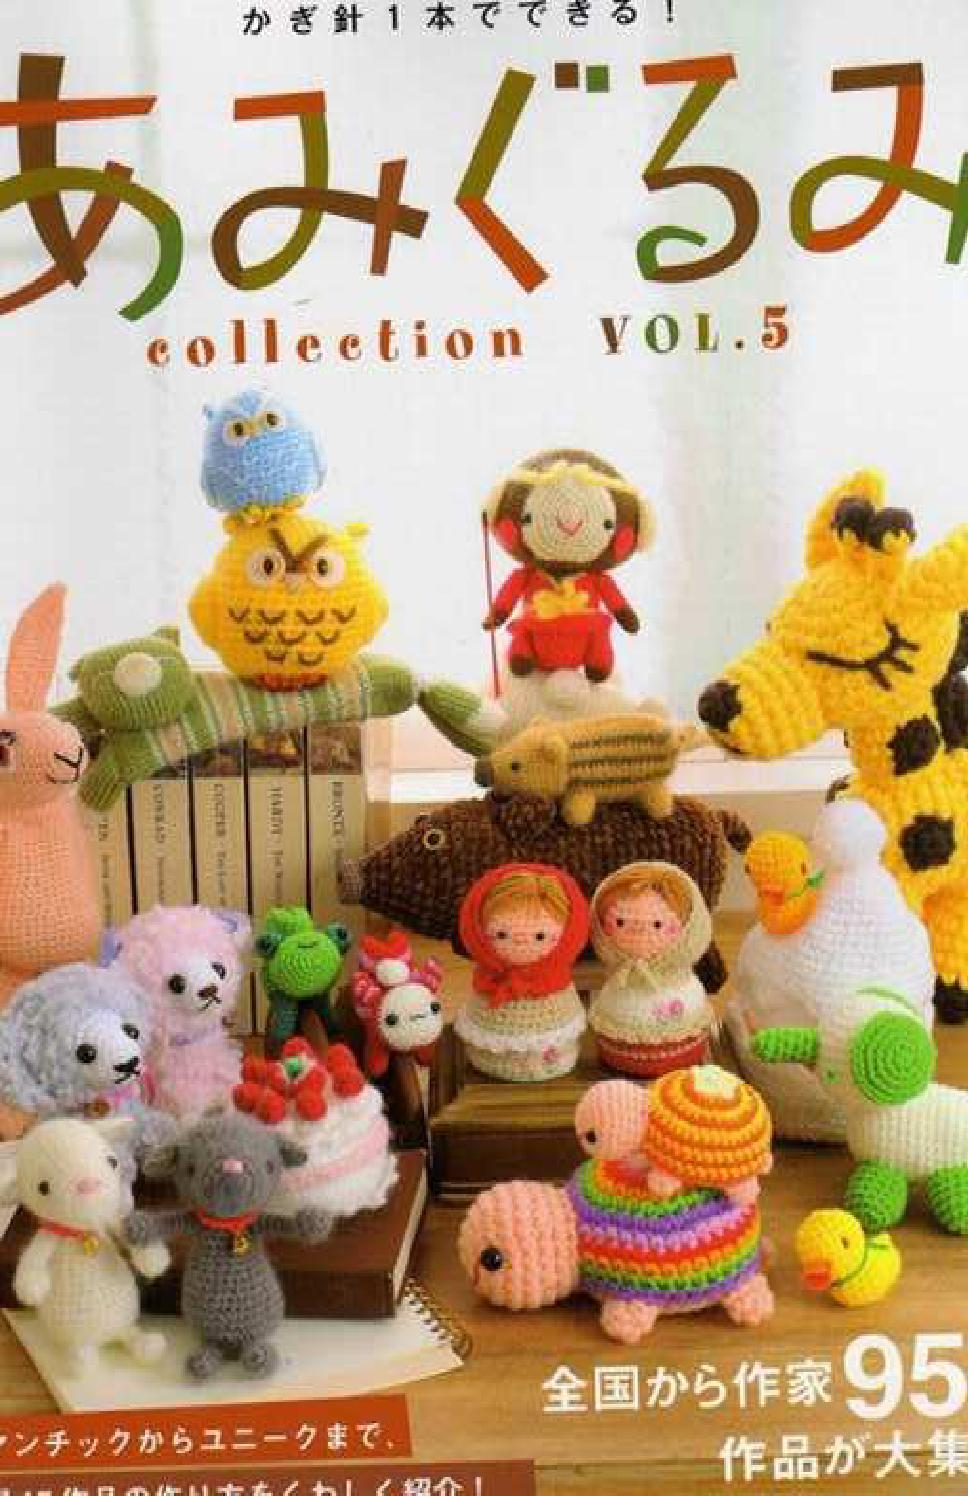 Amigurumi Vol 4 Sonderheft : Amigurumi colletion vol 5 para pdf by fyeye - issuu